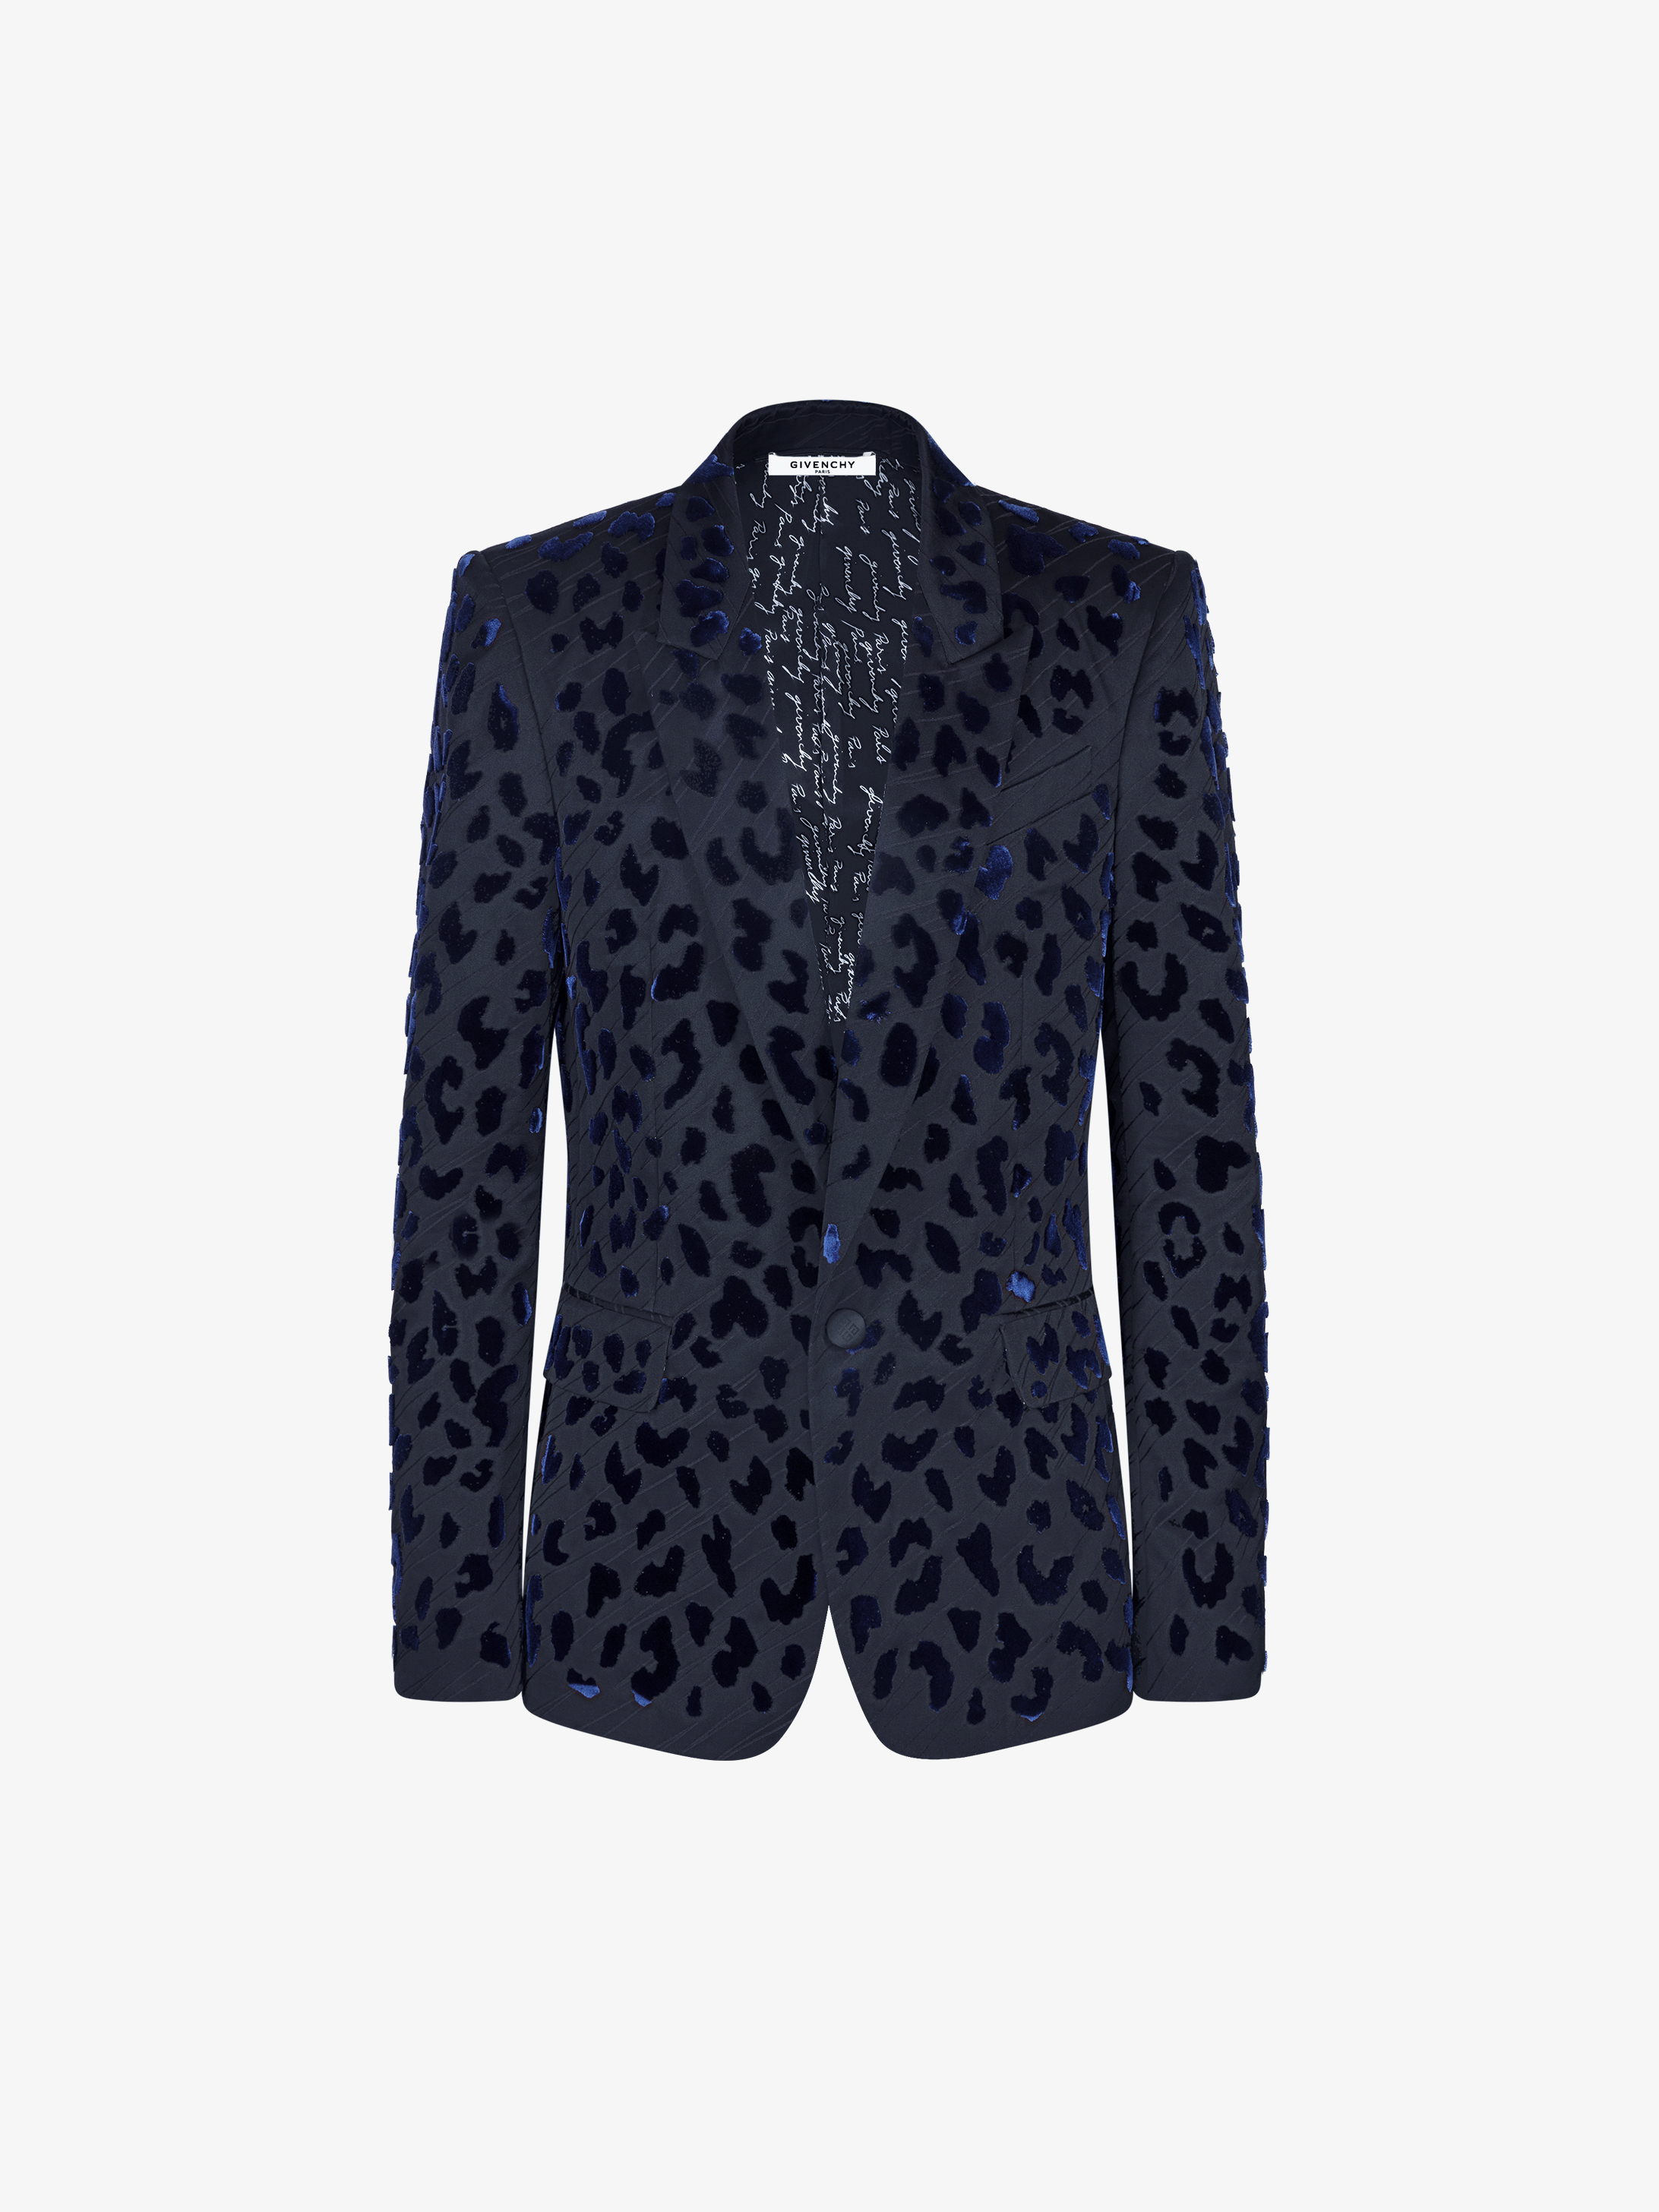 Tufting leopard jacquard jacket